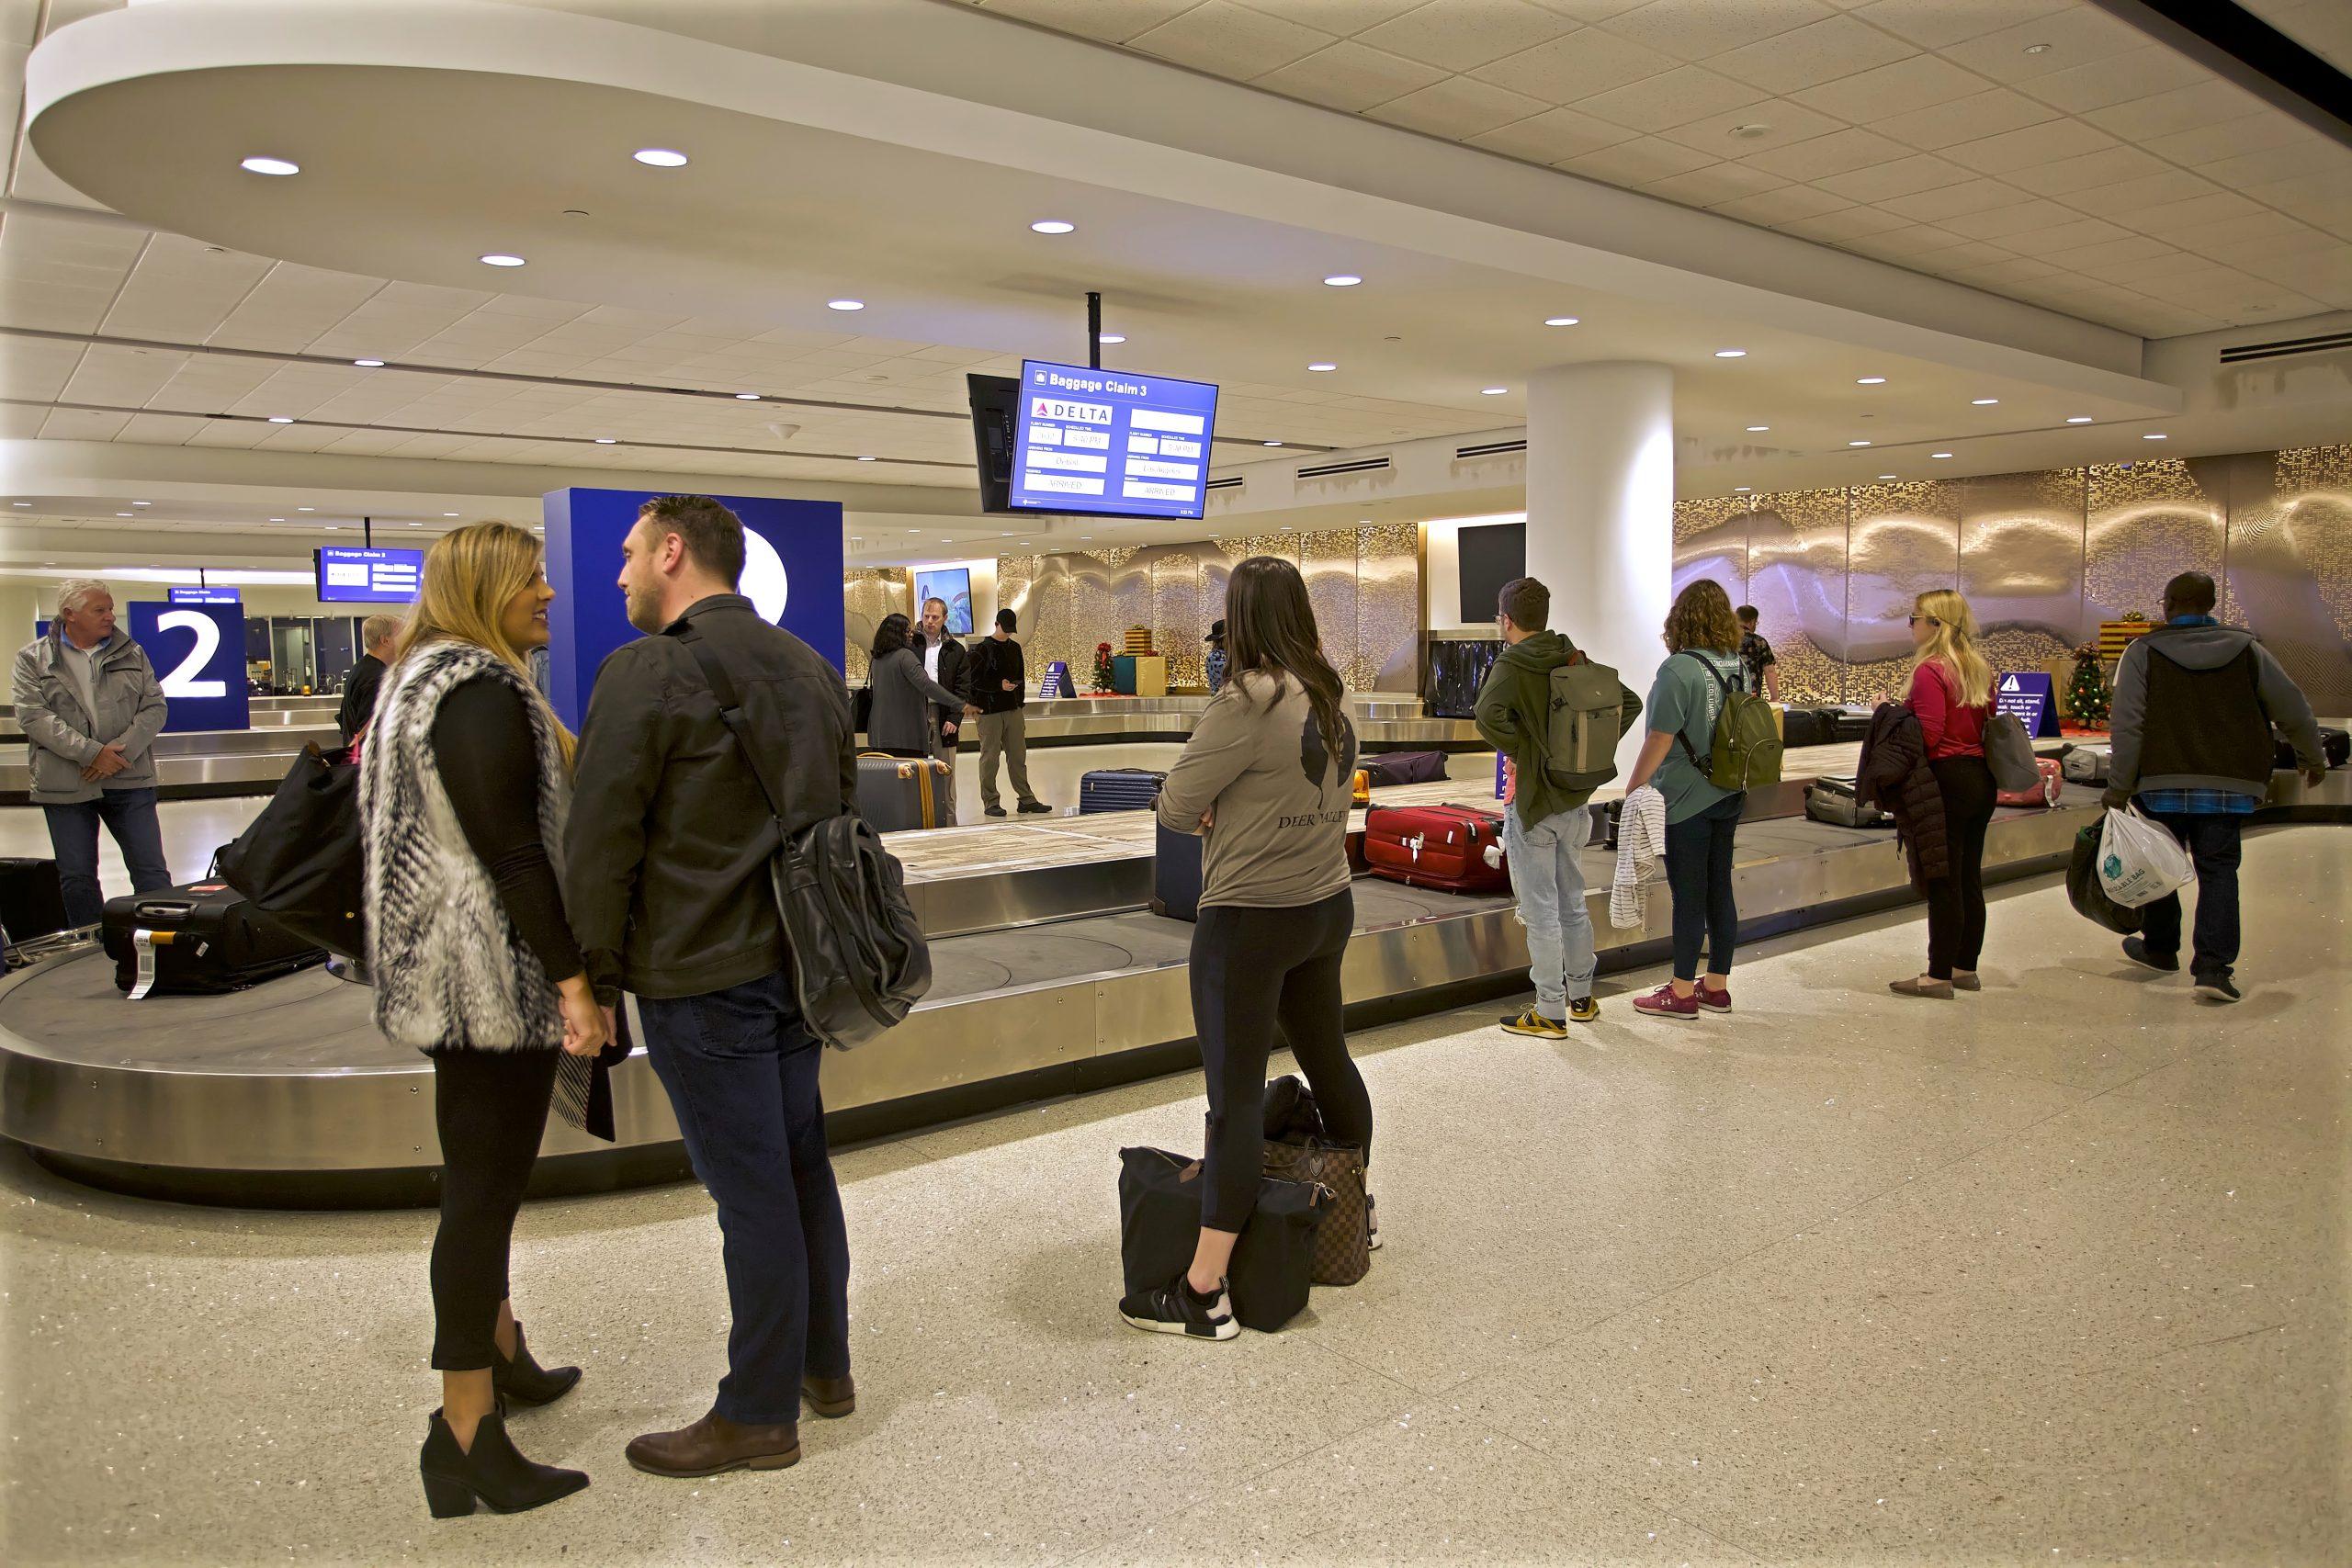 Ankommende passagerer venter på bagagen i Louis Armstrong New Orleans International Airport (Foto: Elliott Cowand Jr | shutterstock)